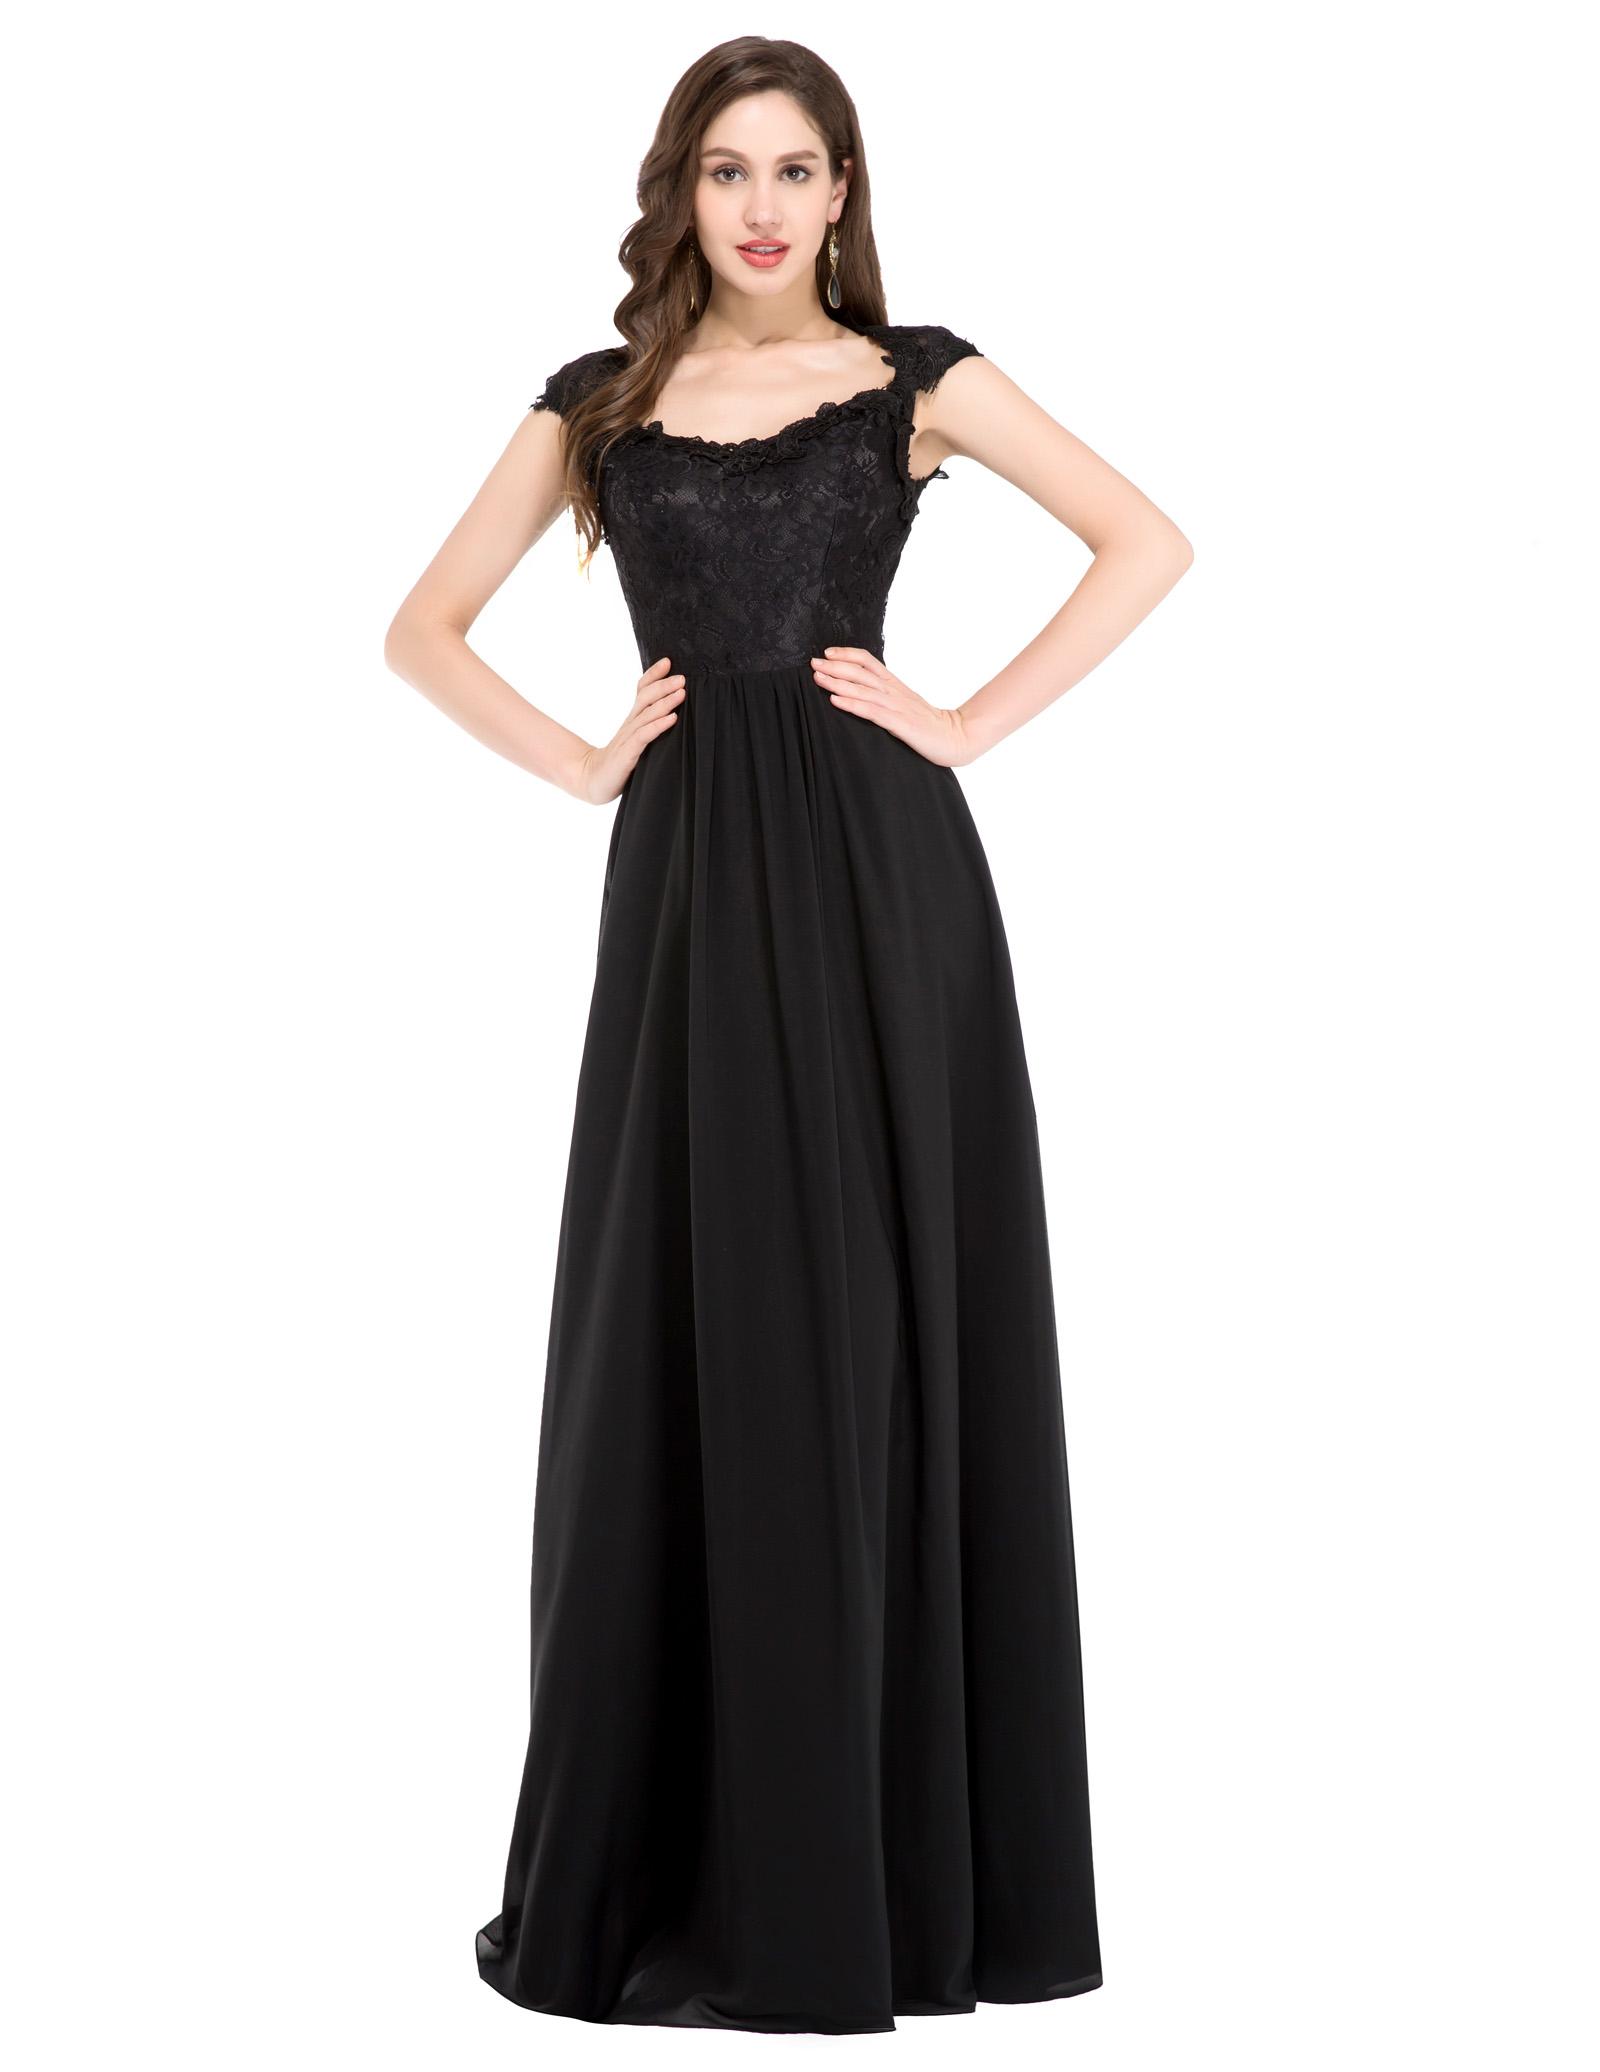 elegant black prom dresses - photo #28